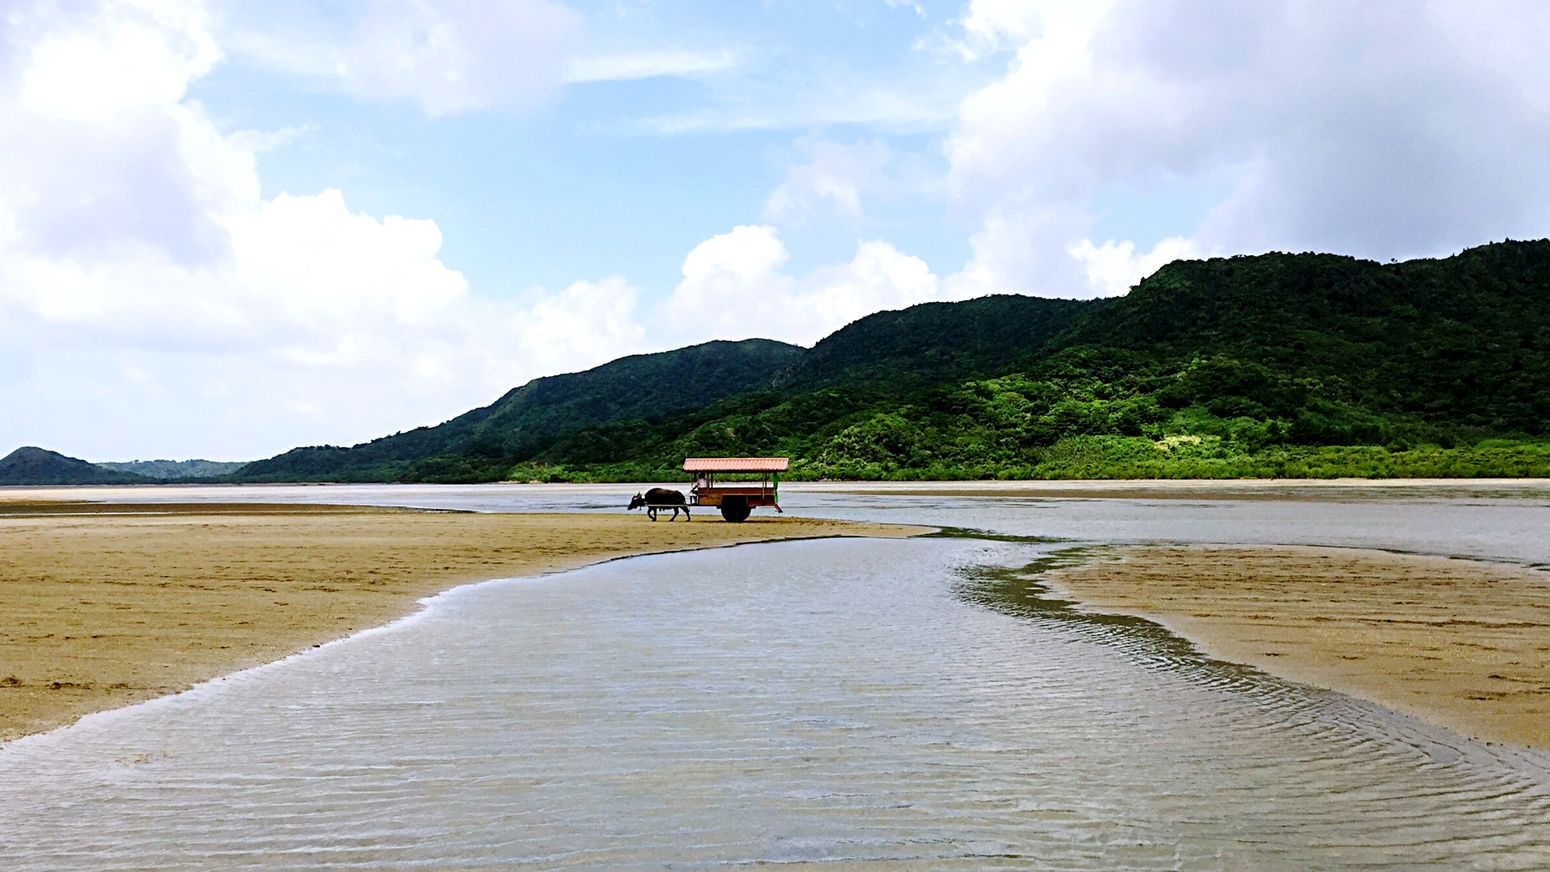 EyeEm Nature Lover EyeEm Best Shots in Iriomote Island Okinawa Japan Japan Photography Summer2015 沖縄 楽しいだけじゃなく、自然と人間を考える機会も、最高!